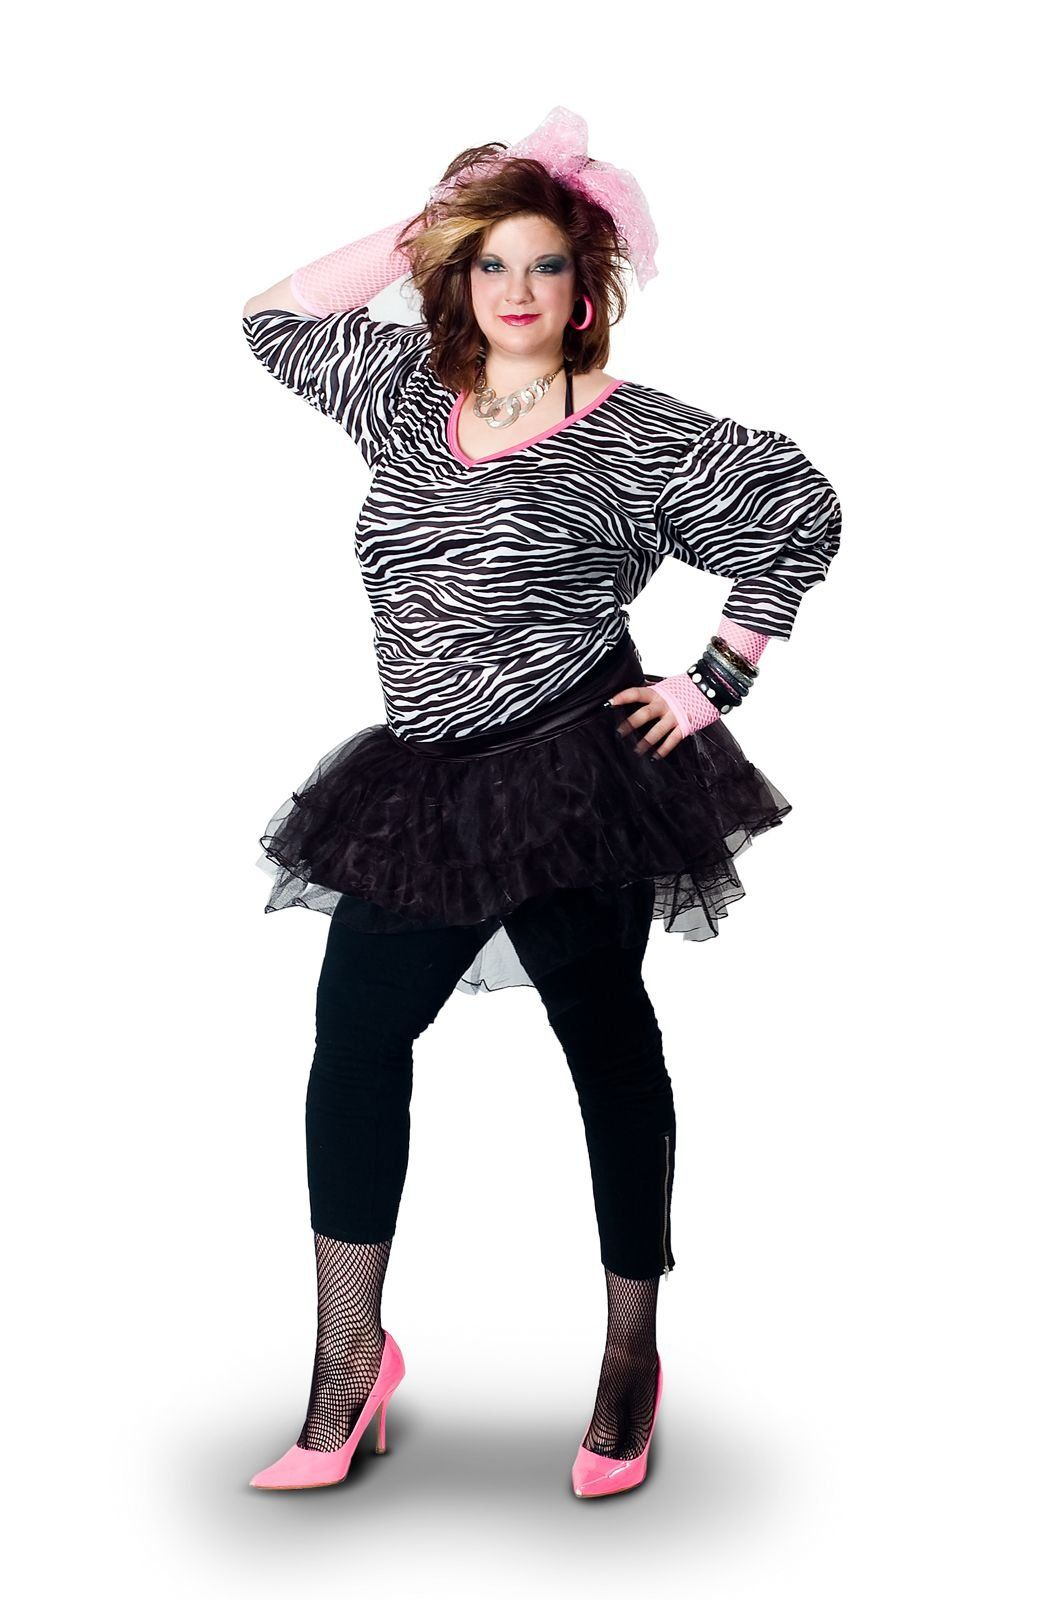 Sunnywood Womenu0027s Plus-Size Lava Diva Hip Hop 80u0027s Costume Multi X-Large  sc 1 st  Pinterest & Sunnywood Womenu0027s Plus-Size Lava Diva Hip Hop 80u0027s Costume Multi X ...